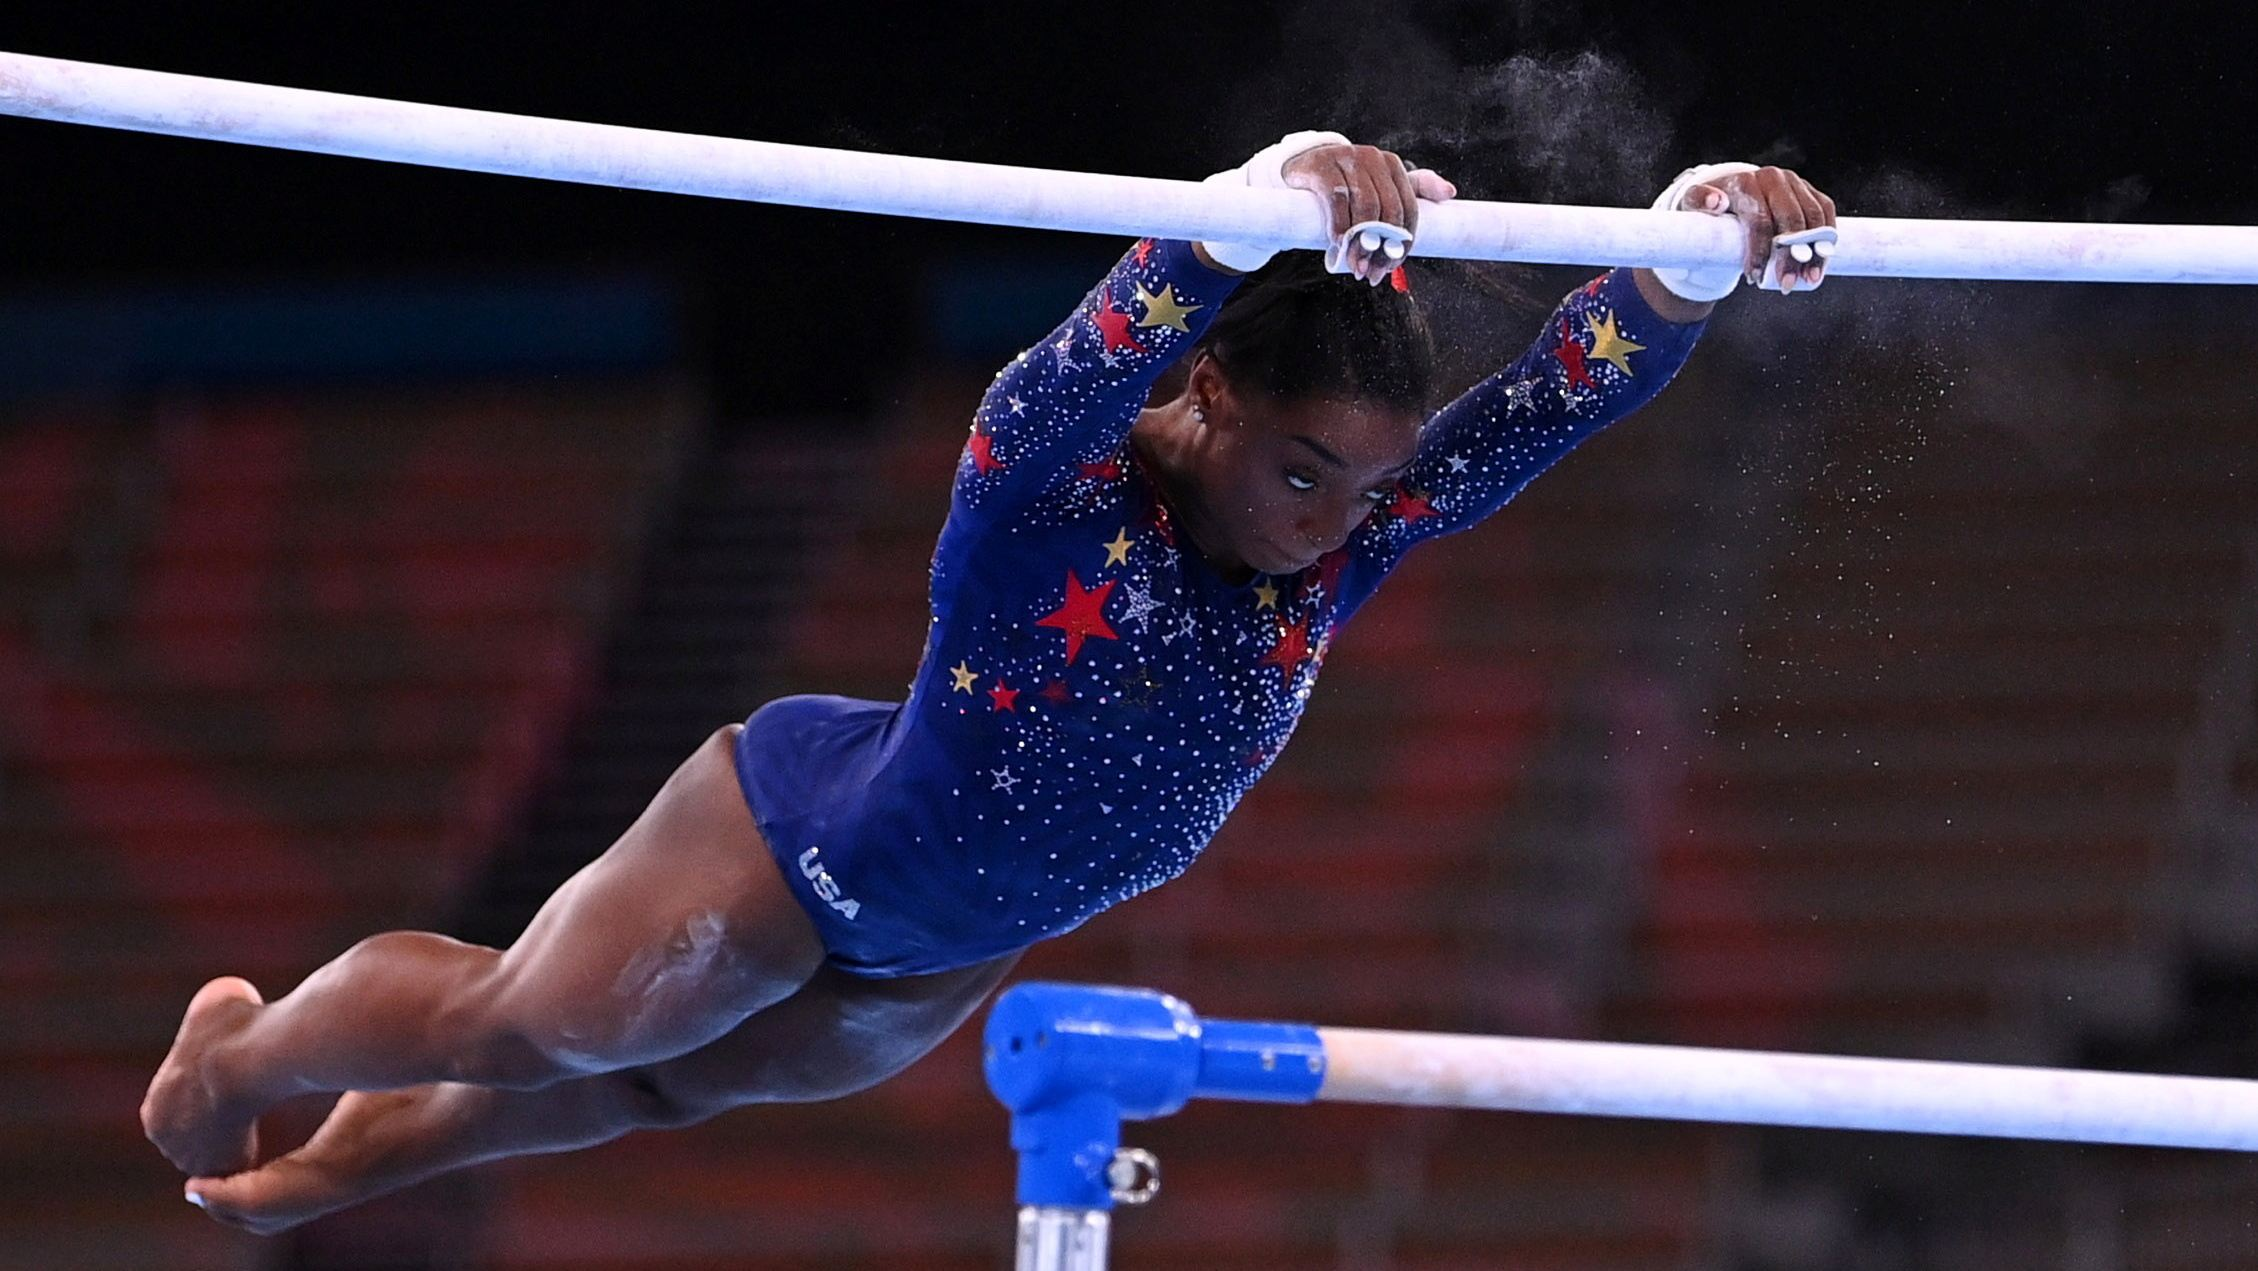 Olympic gymnastics betting underage